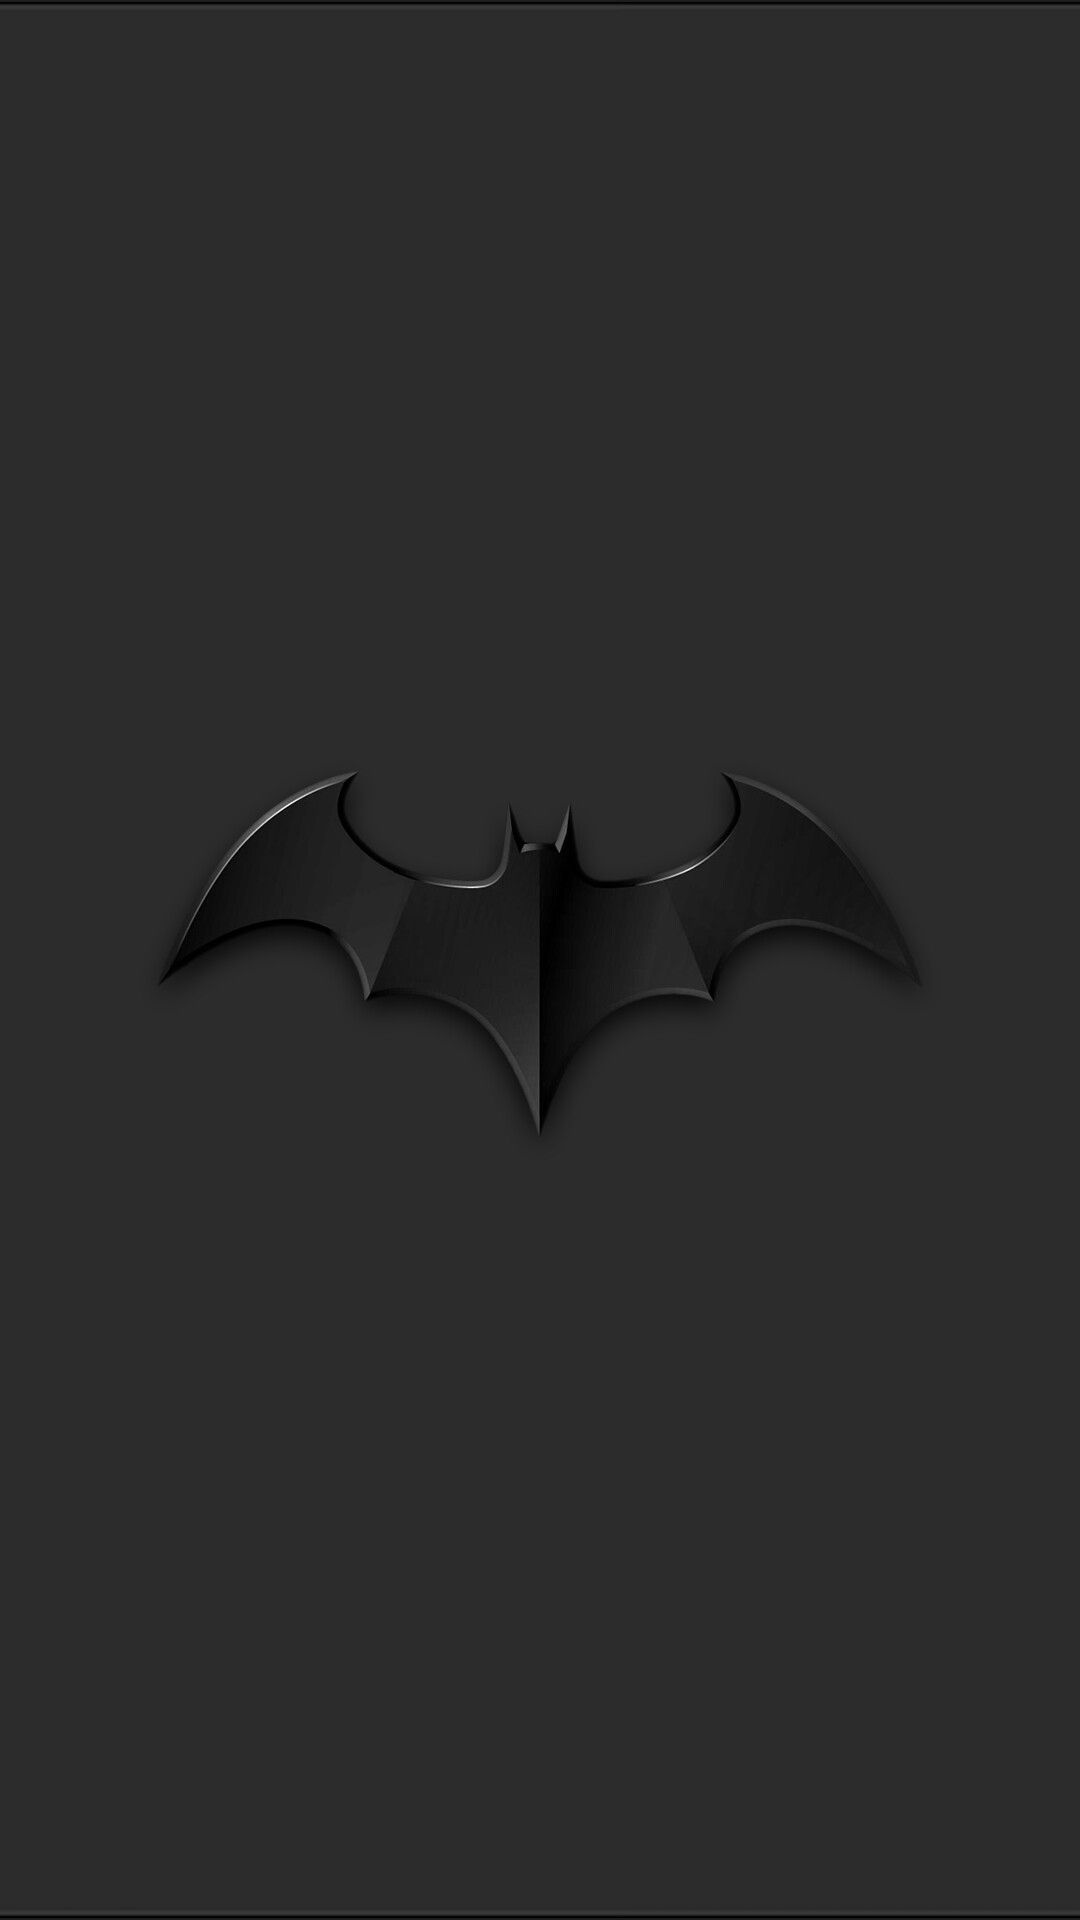 Batman Logo Wallpaper Batman Wallpaper Batman Wallpaper